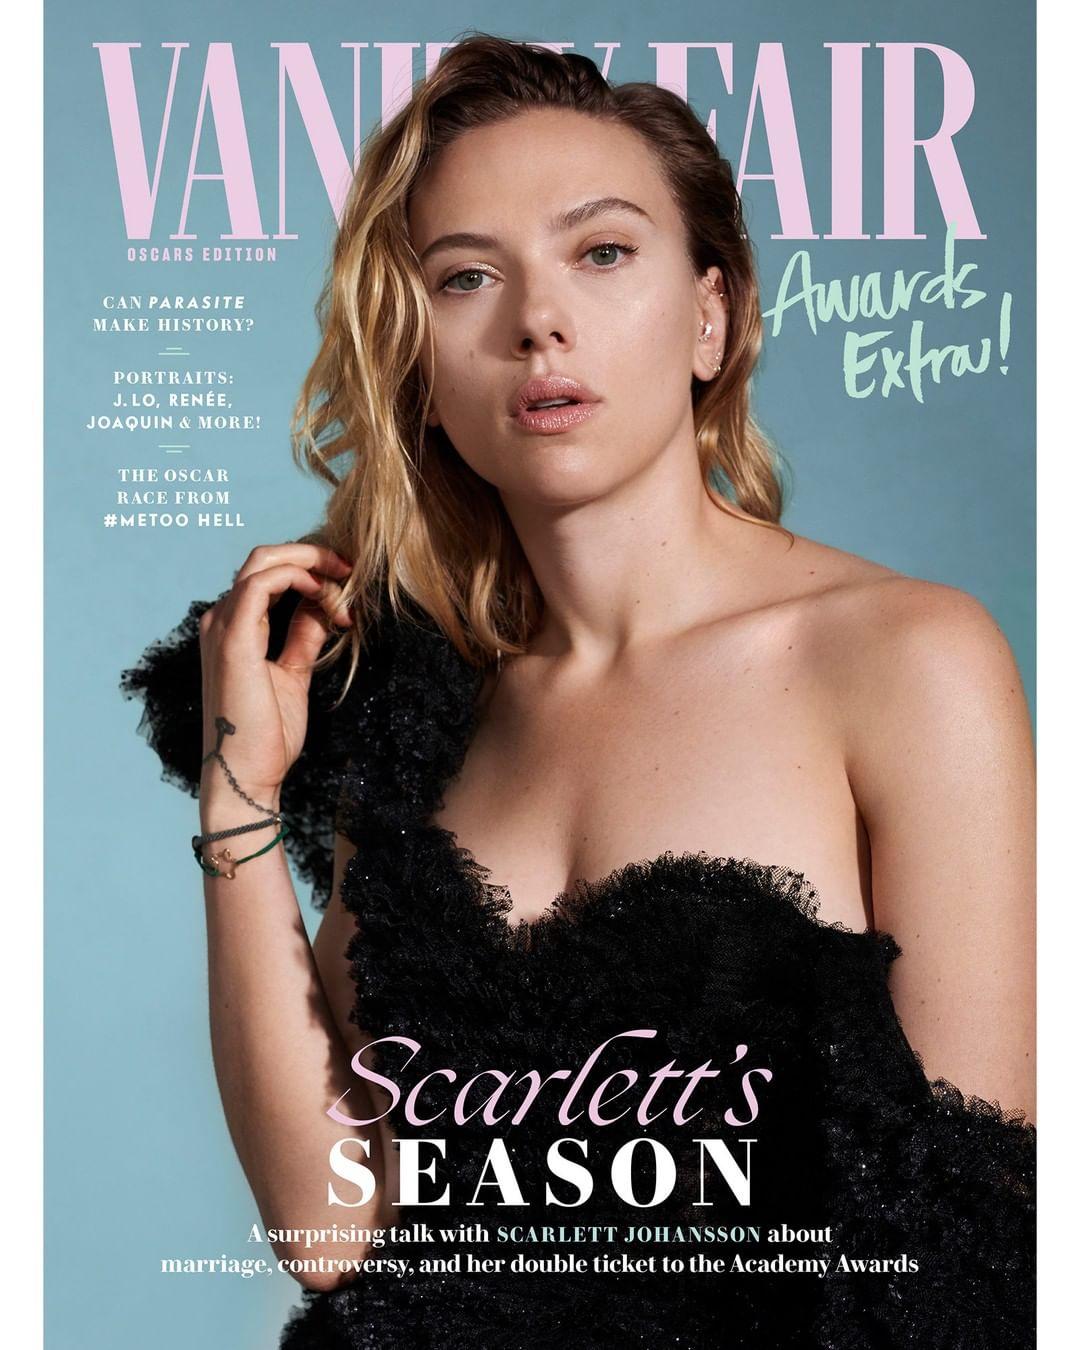 Vanity Fair Cover January 2020.Scarlett Johansson On Vanity Fair Magazine Cover Iscoopboye